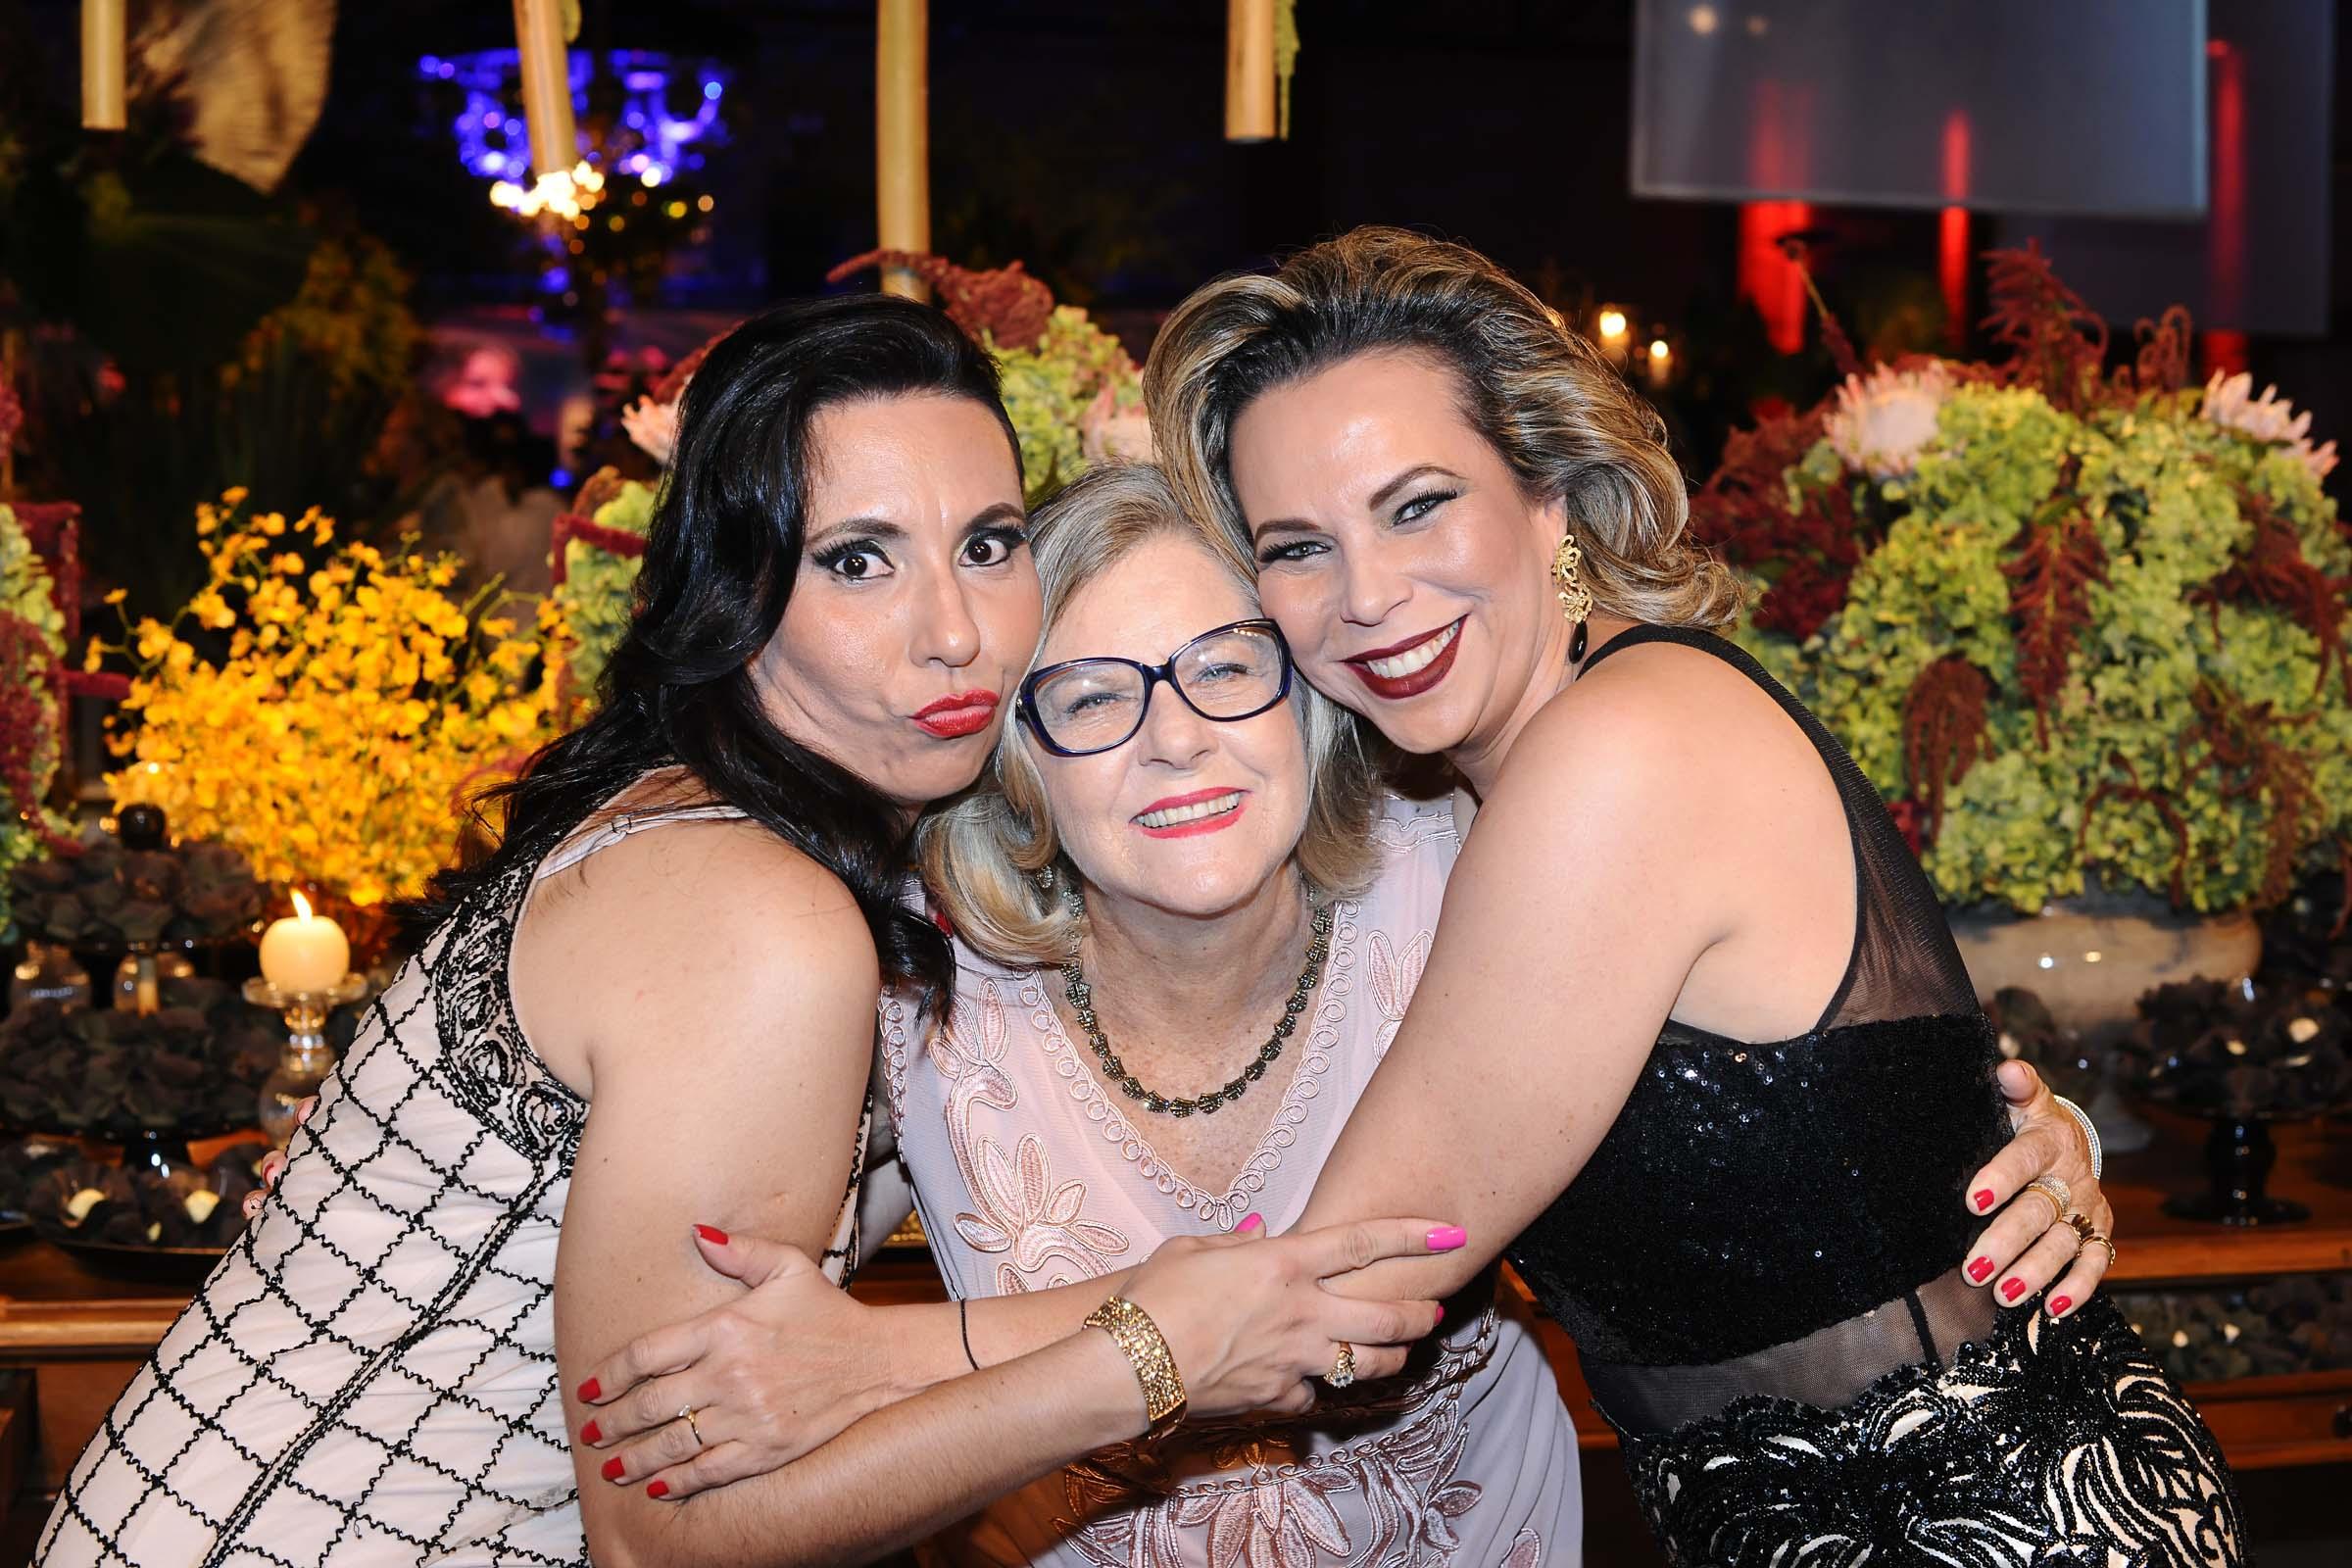 As amigas Samayra do Prado, Maria Elizabeth Machado e Nayara Barbosa